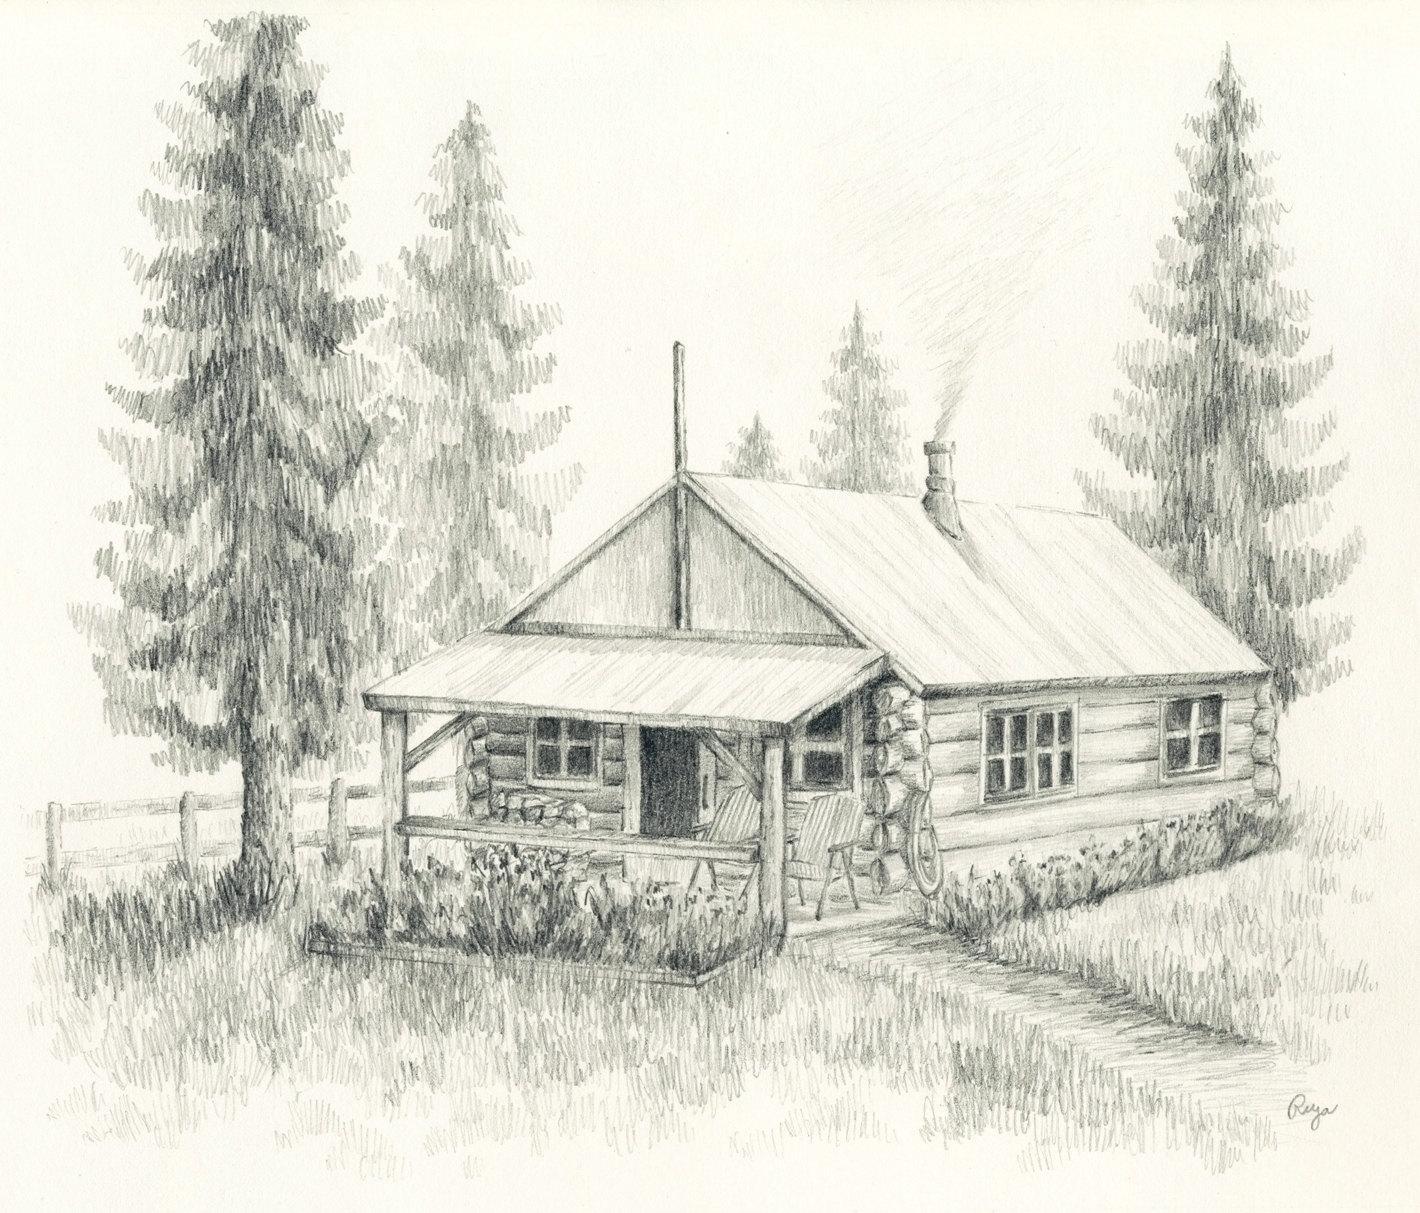 Drawn bulding  log cabin Drawing Meditation Cabin Log hut